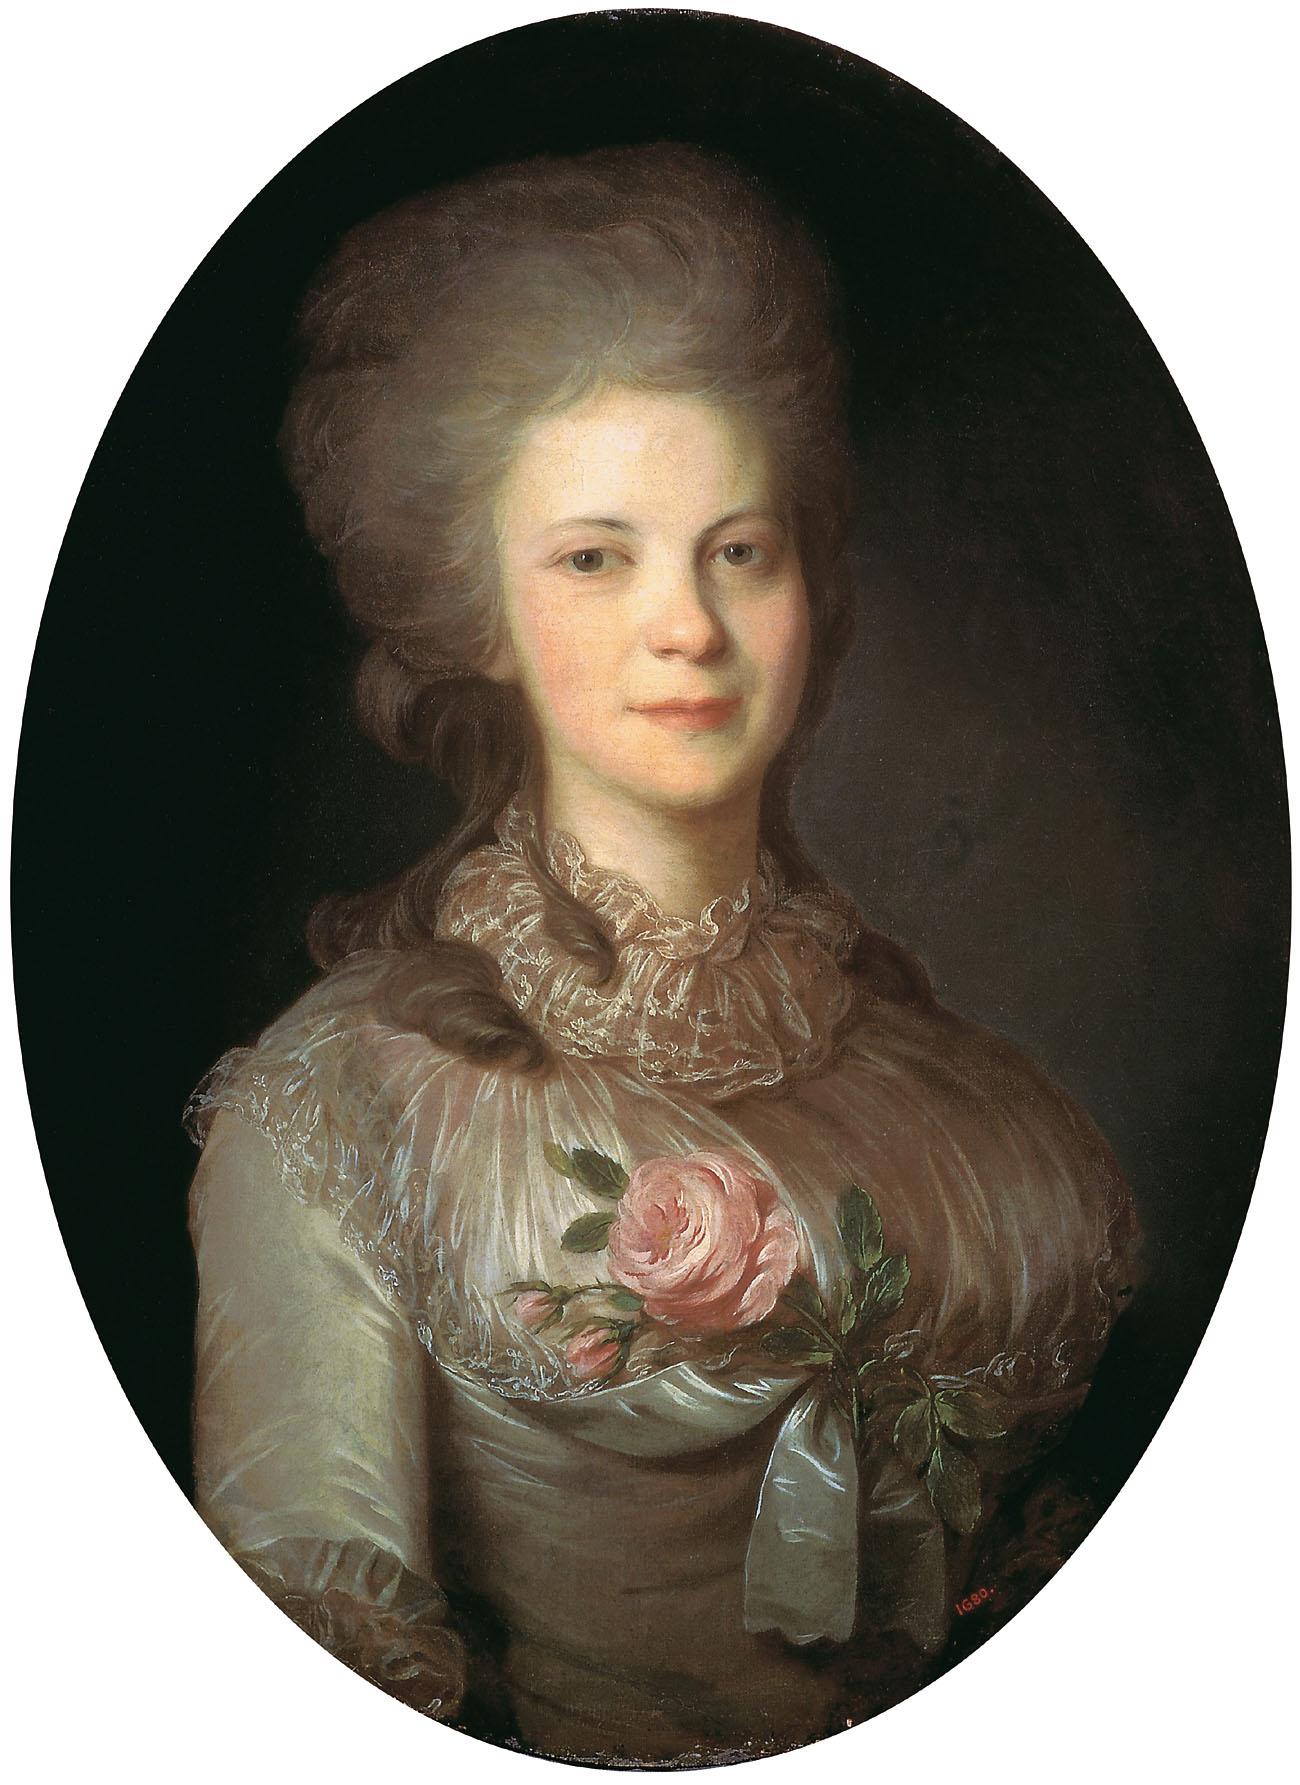 Portrait of Varvara Nikolaevna Surovceva, 1780